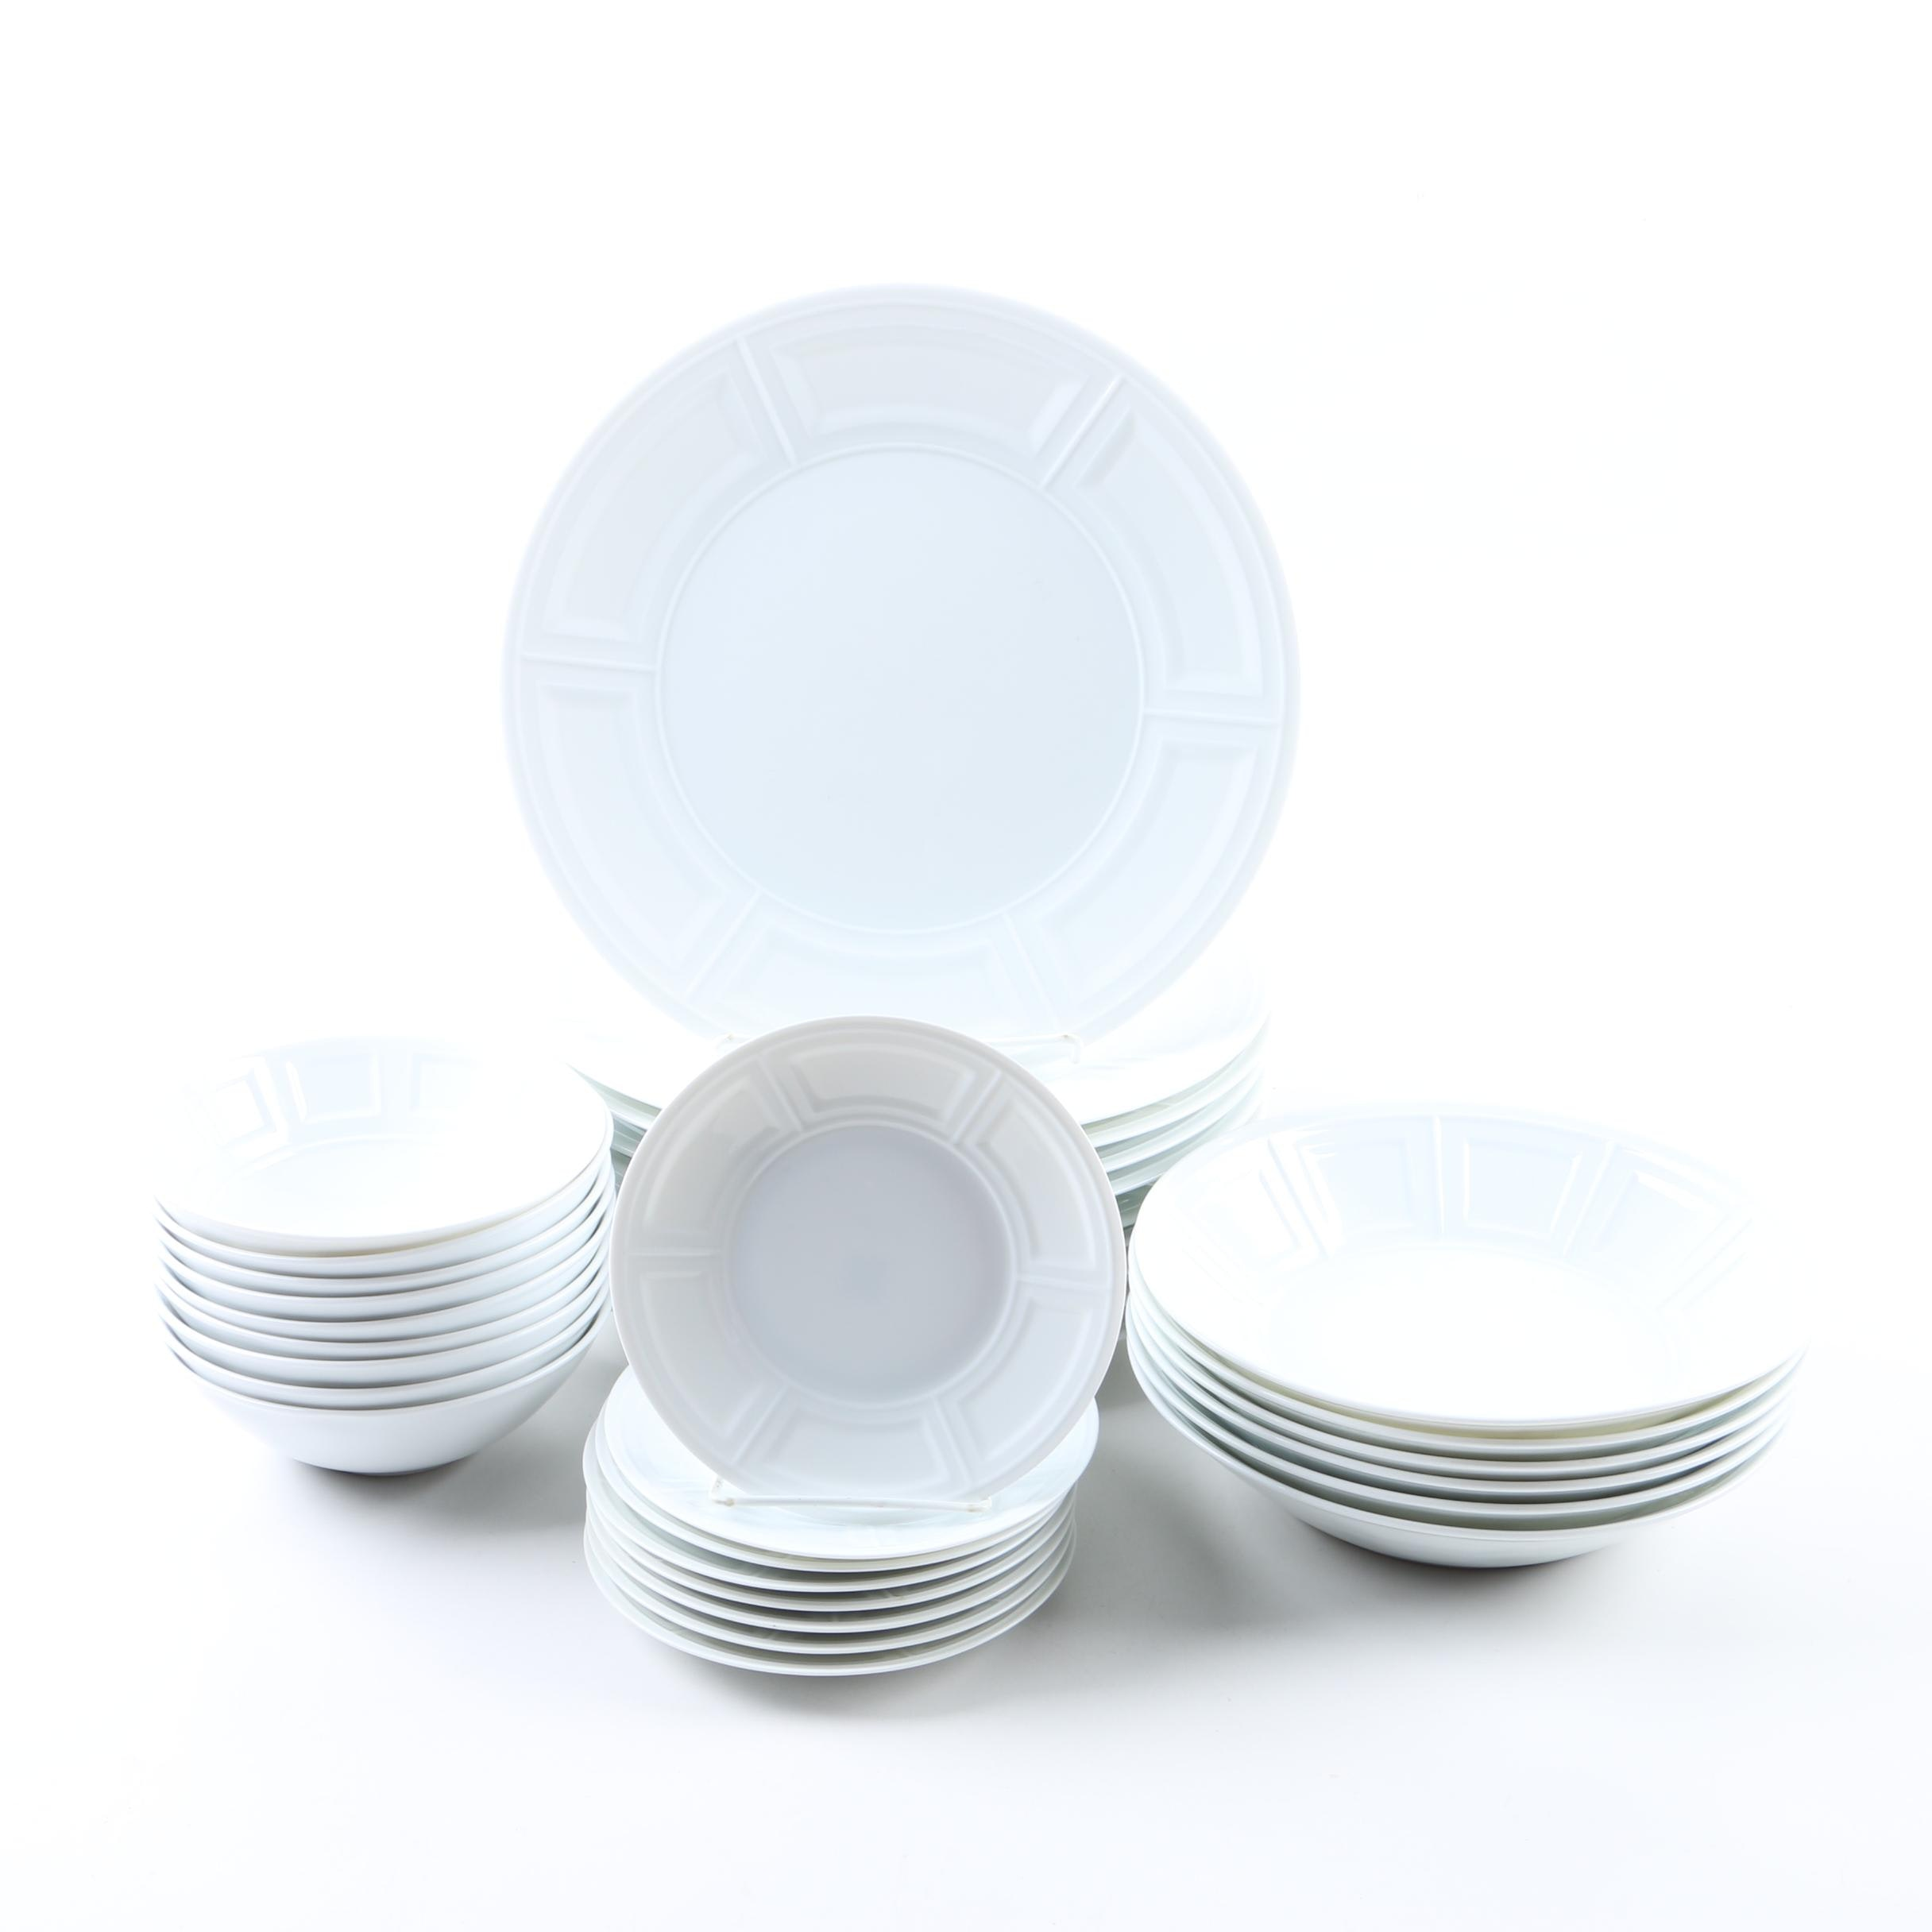 Bernardaud \ Naxos\  Limoges Dinnerware ...  sc 1 st  EBTH.com & Bernardaud \